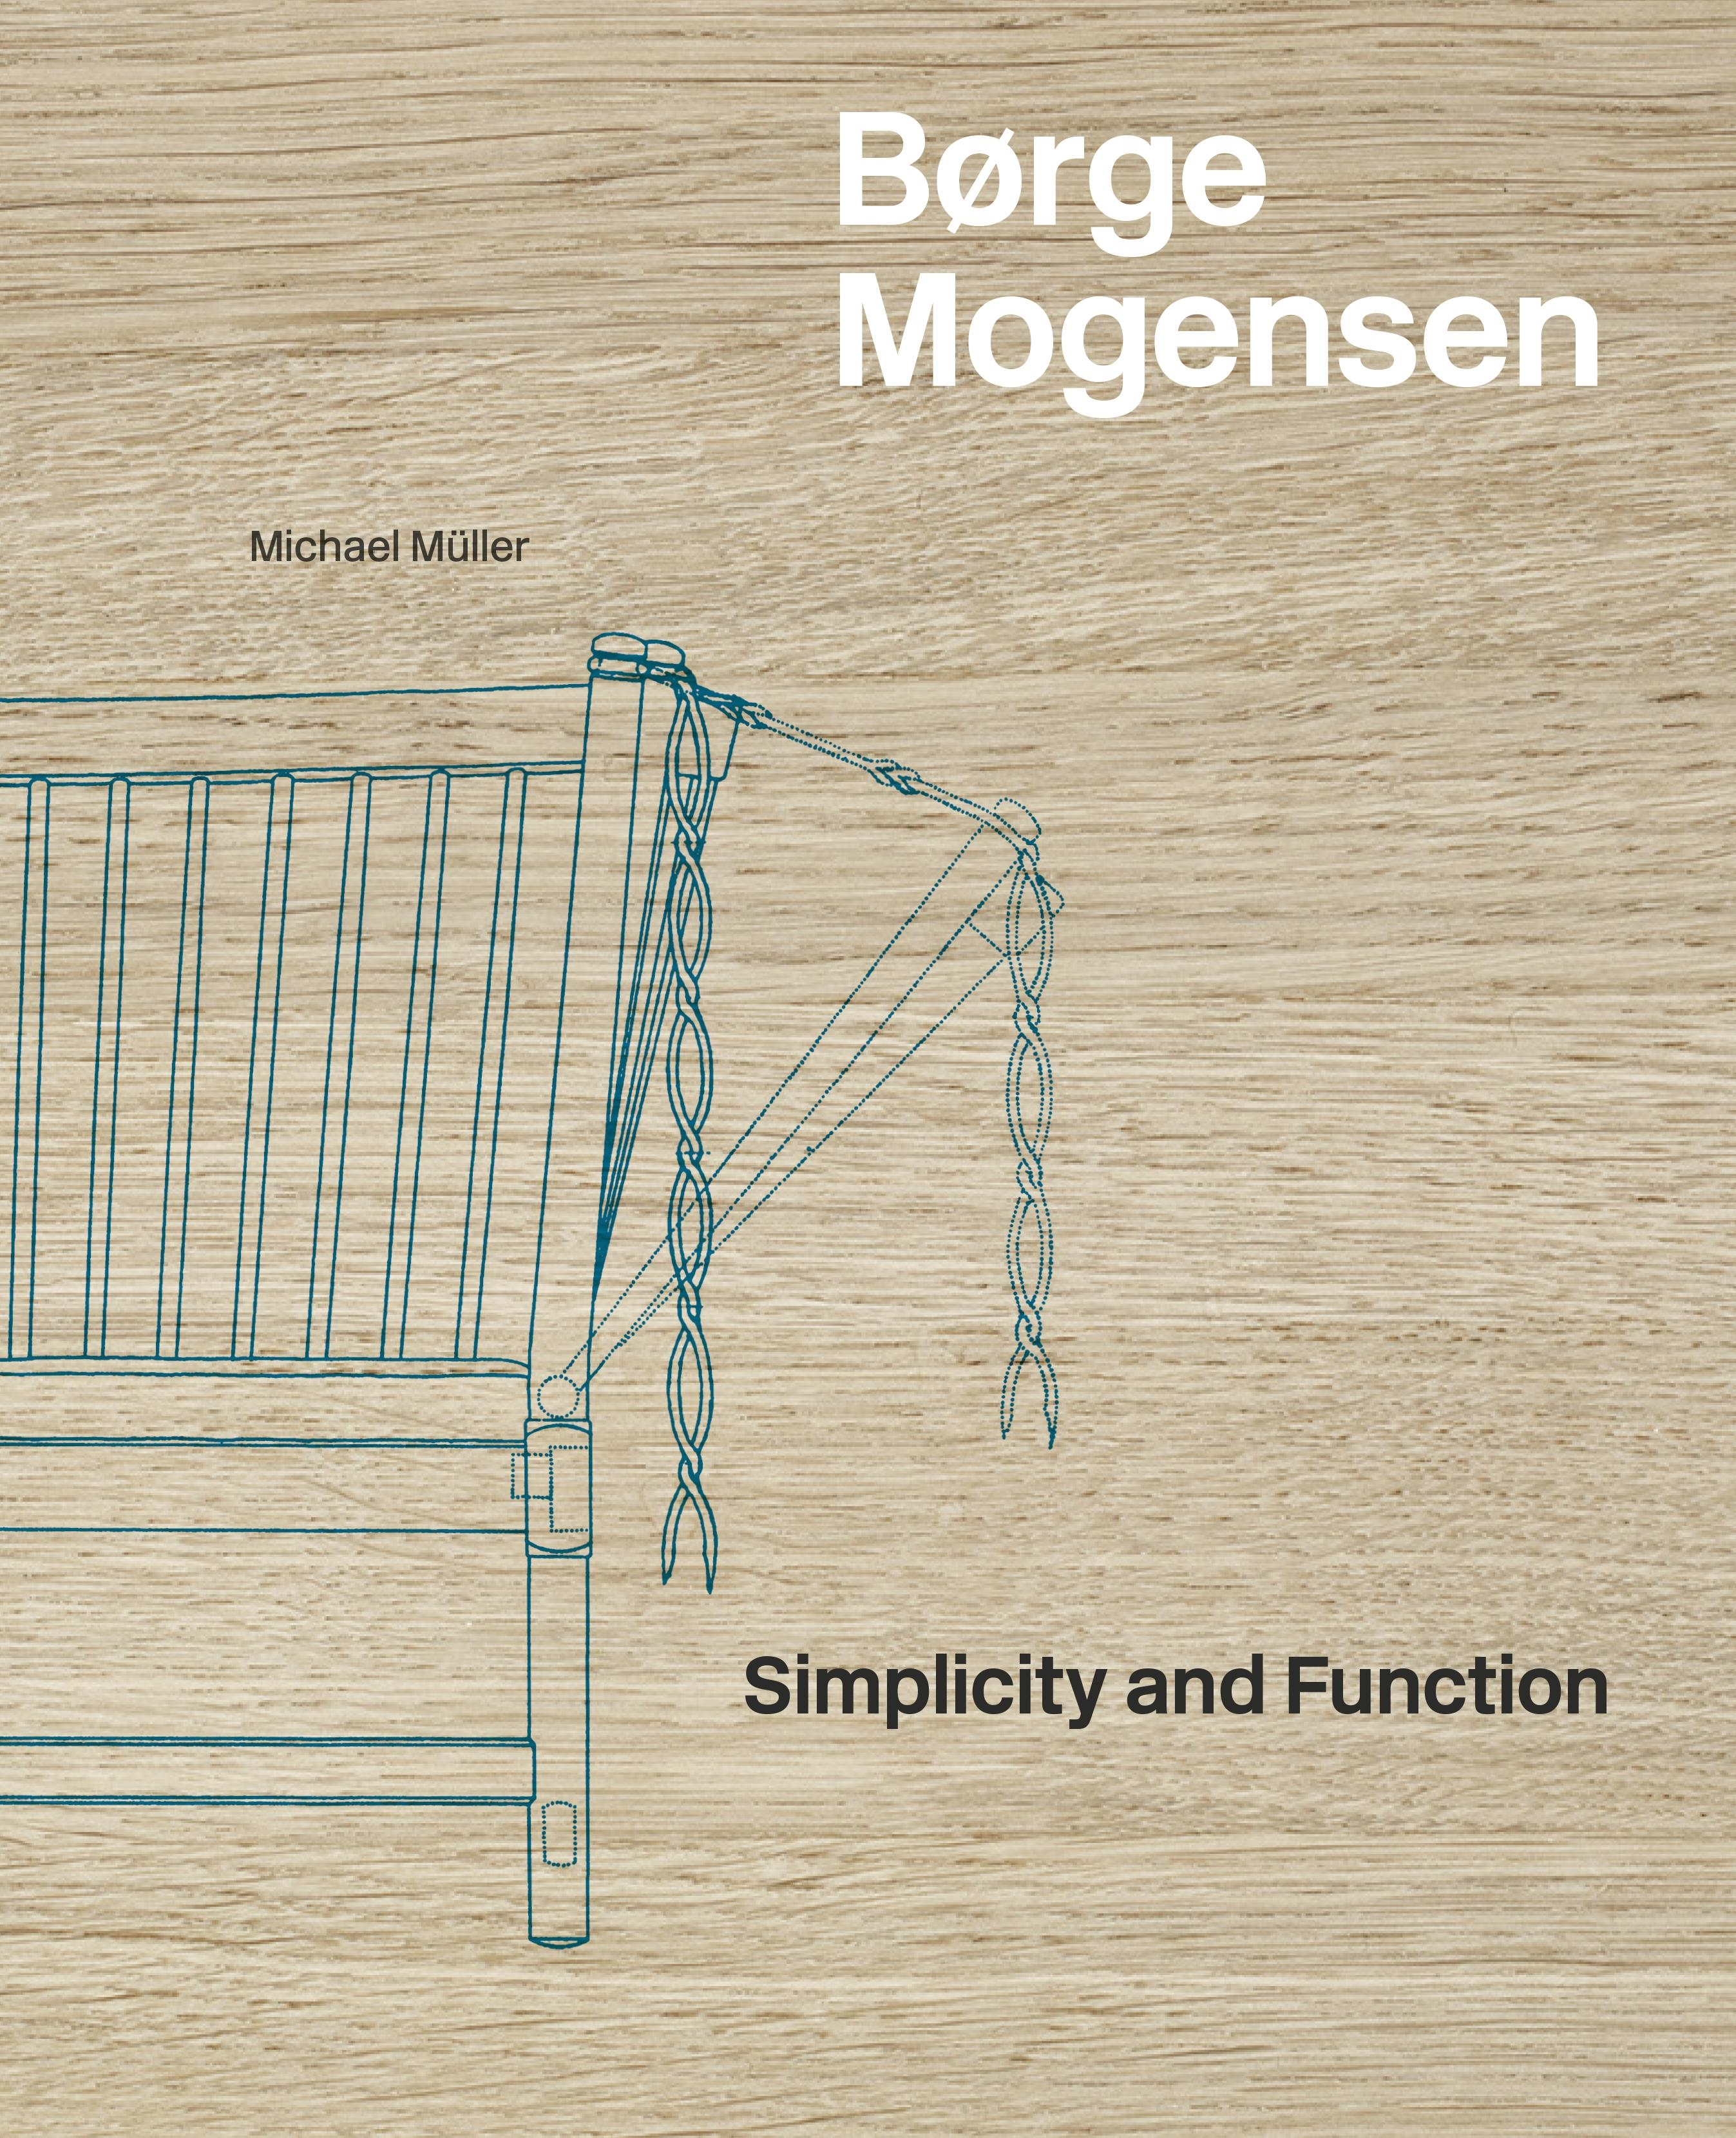 Børge Mogensen, Michael Müller